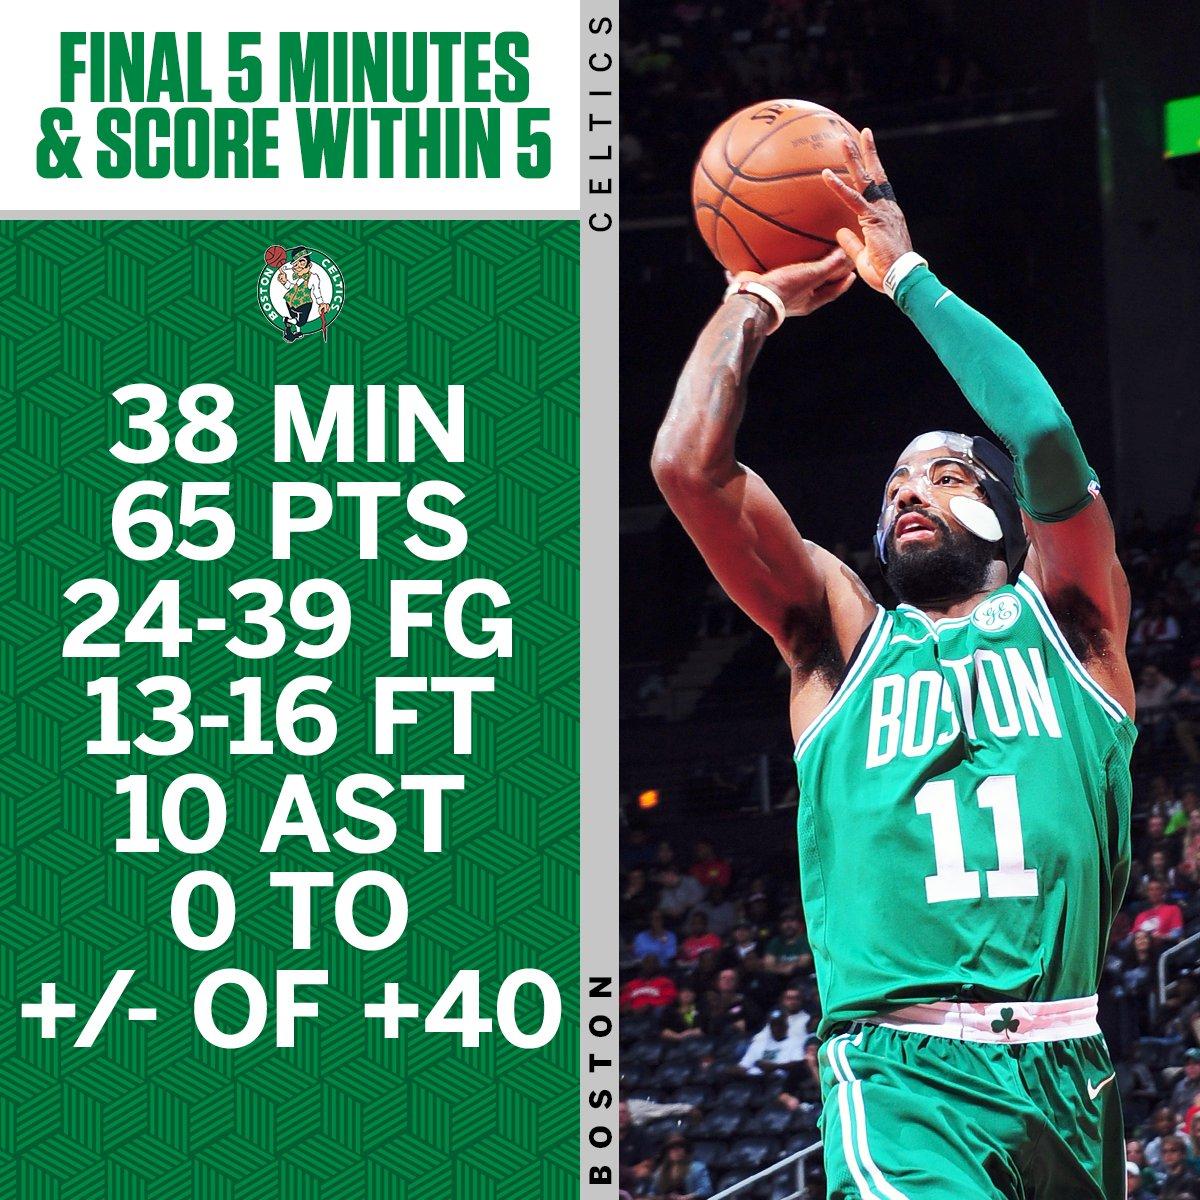 Kyrie Irving has put the Celtics on his back. https://t.co/OrzpVbuQut